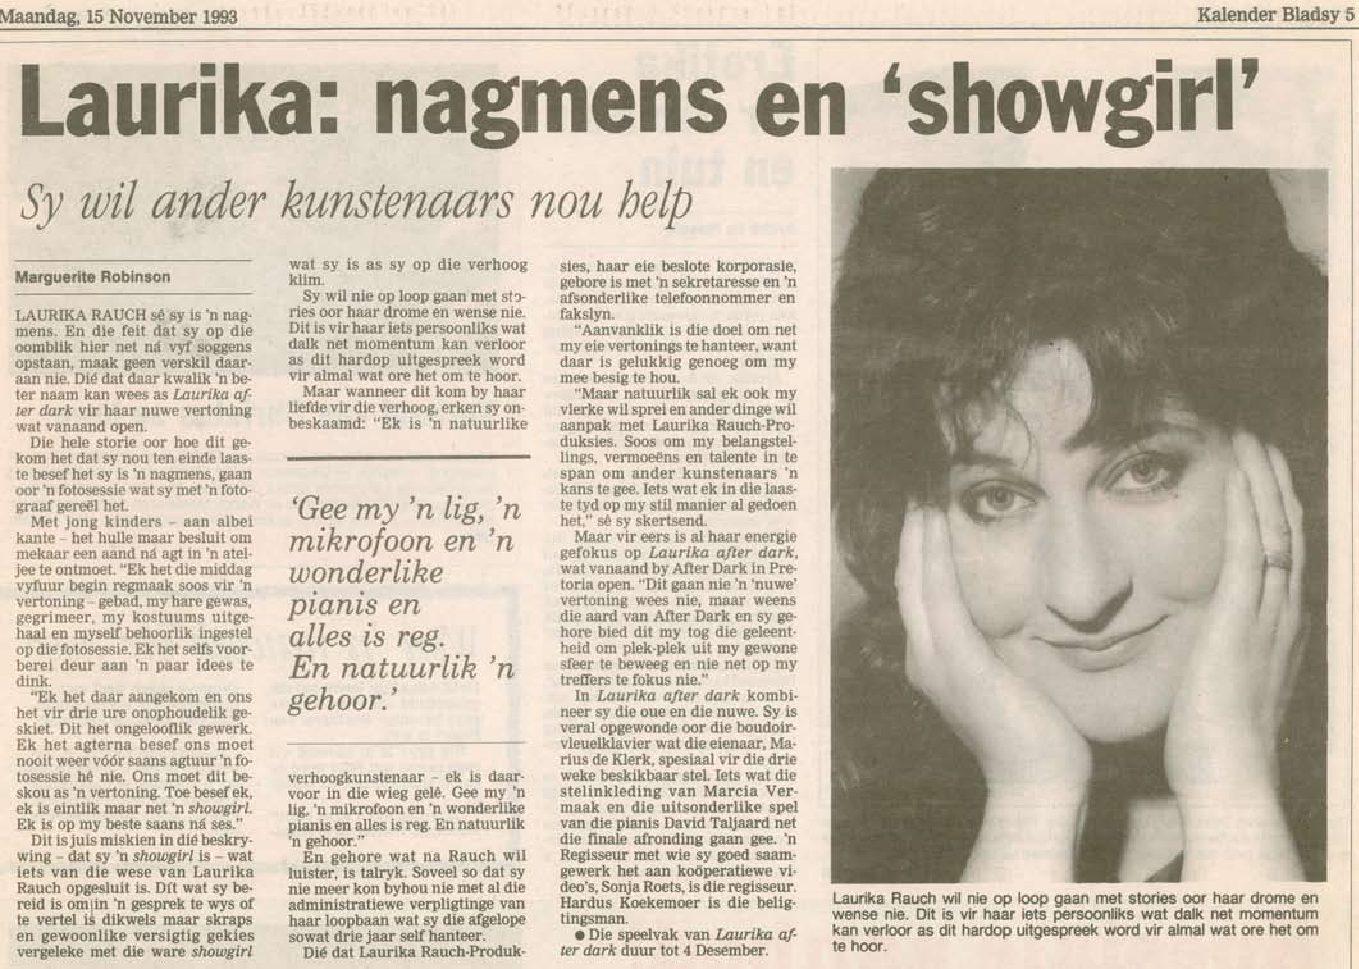 1993-beeld-laurika-nagmens-showgirl